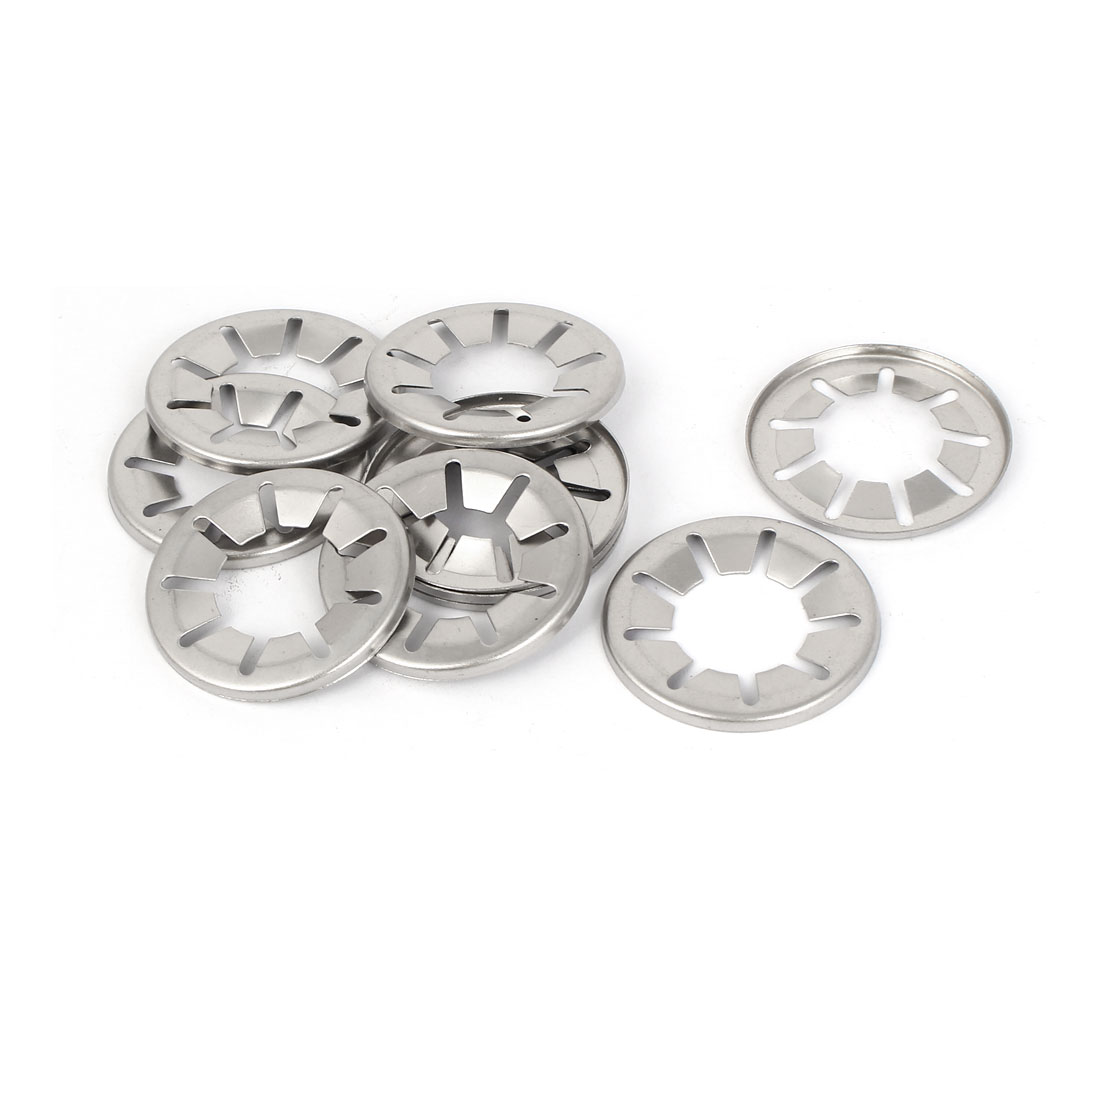 20mm x 39mm x 2.7mm 304 Stainless Steel Starlock Washers Fasteners 10 Pcs